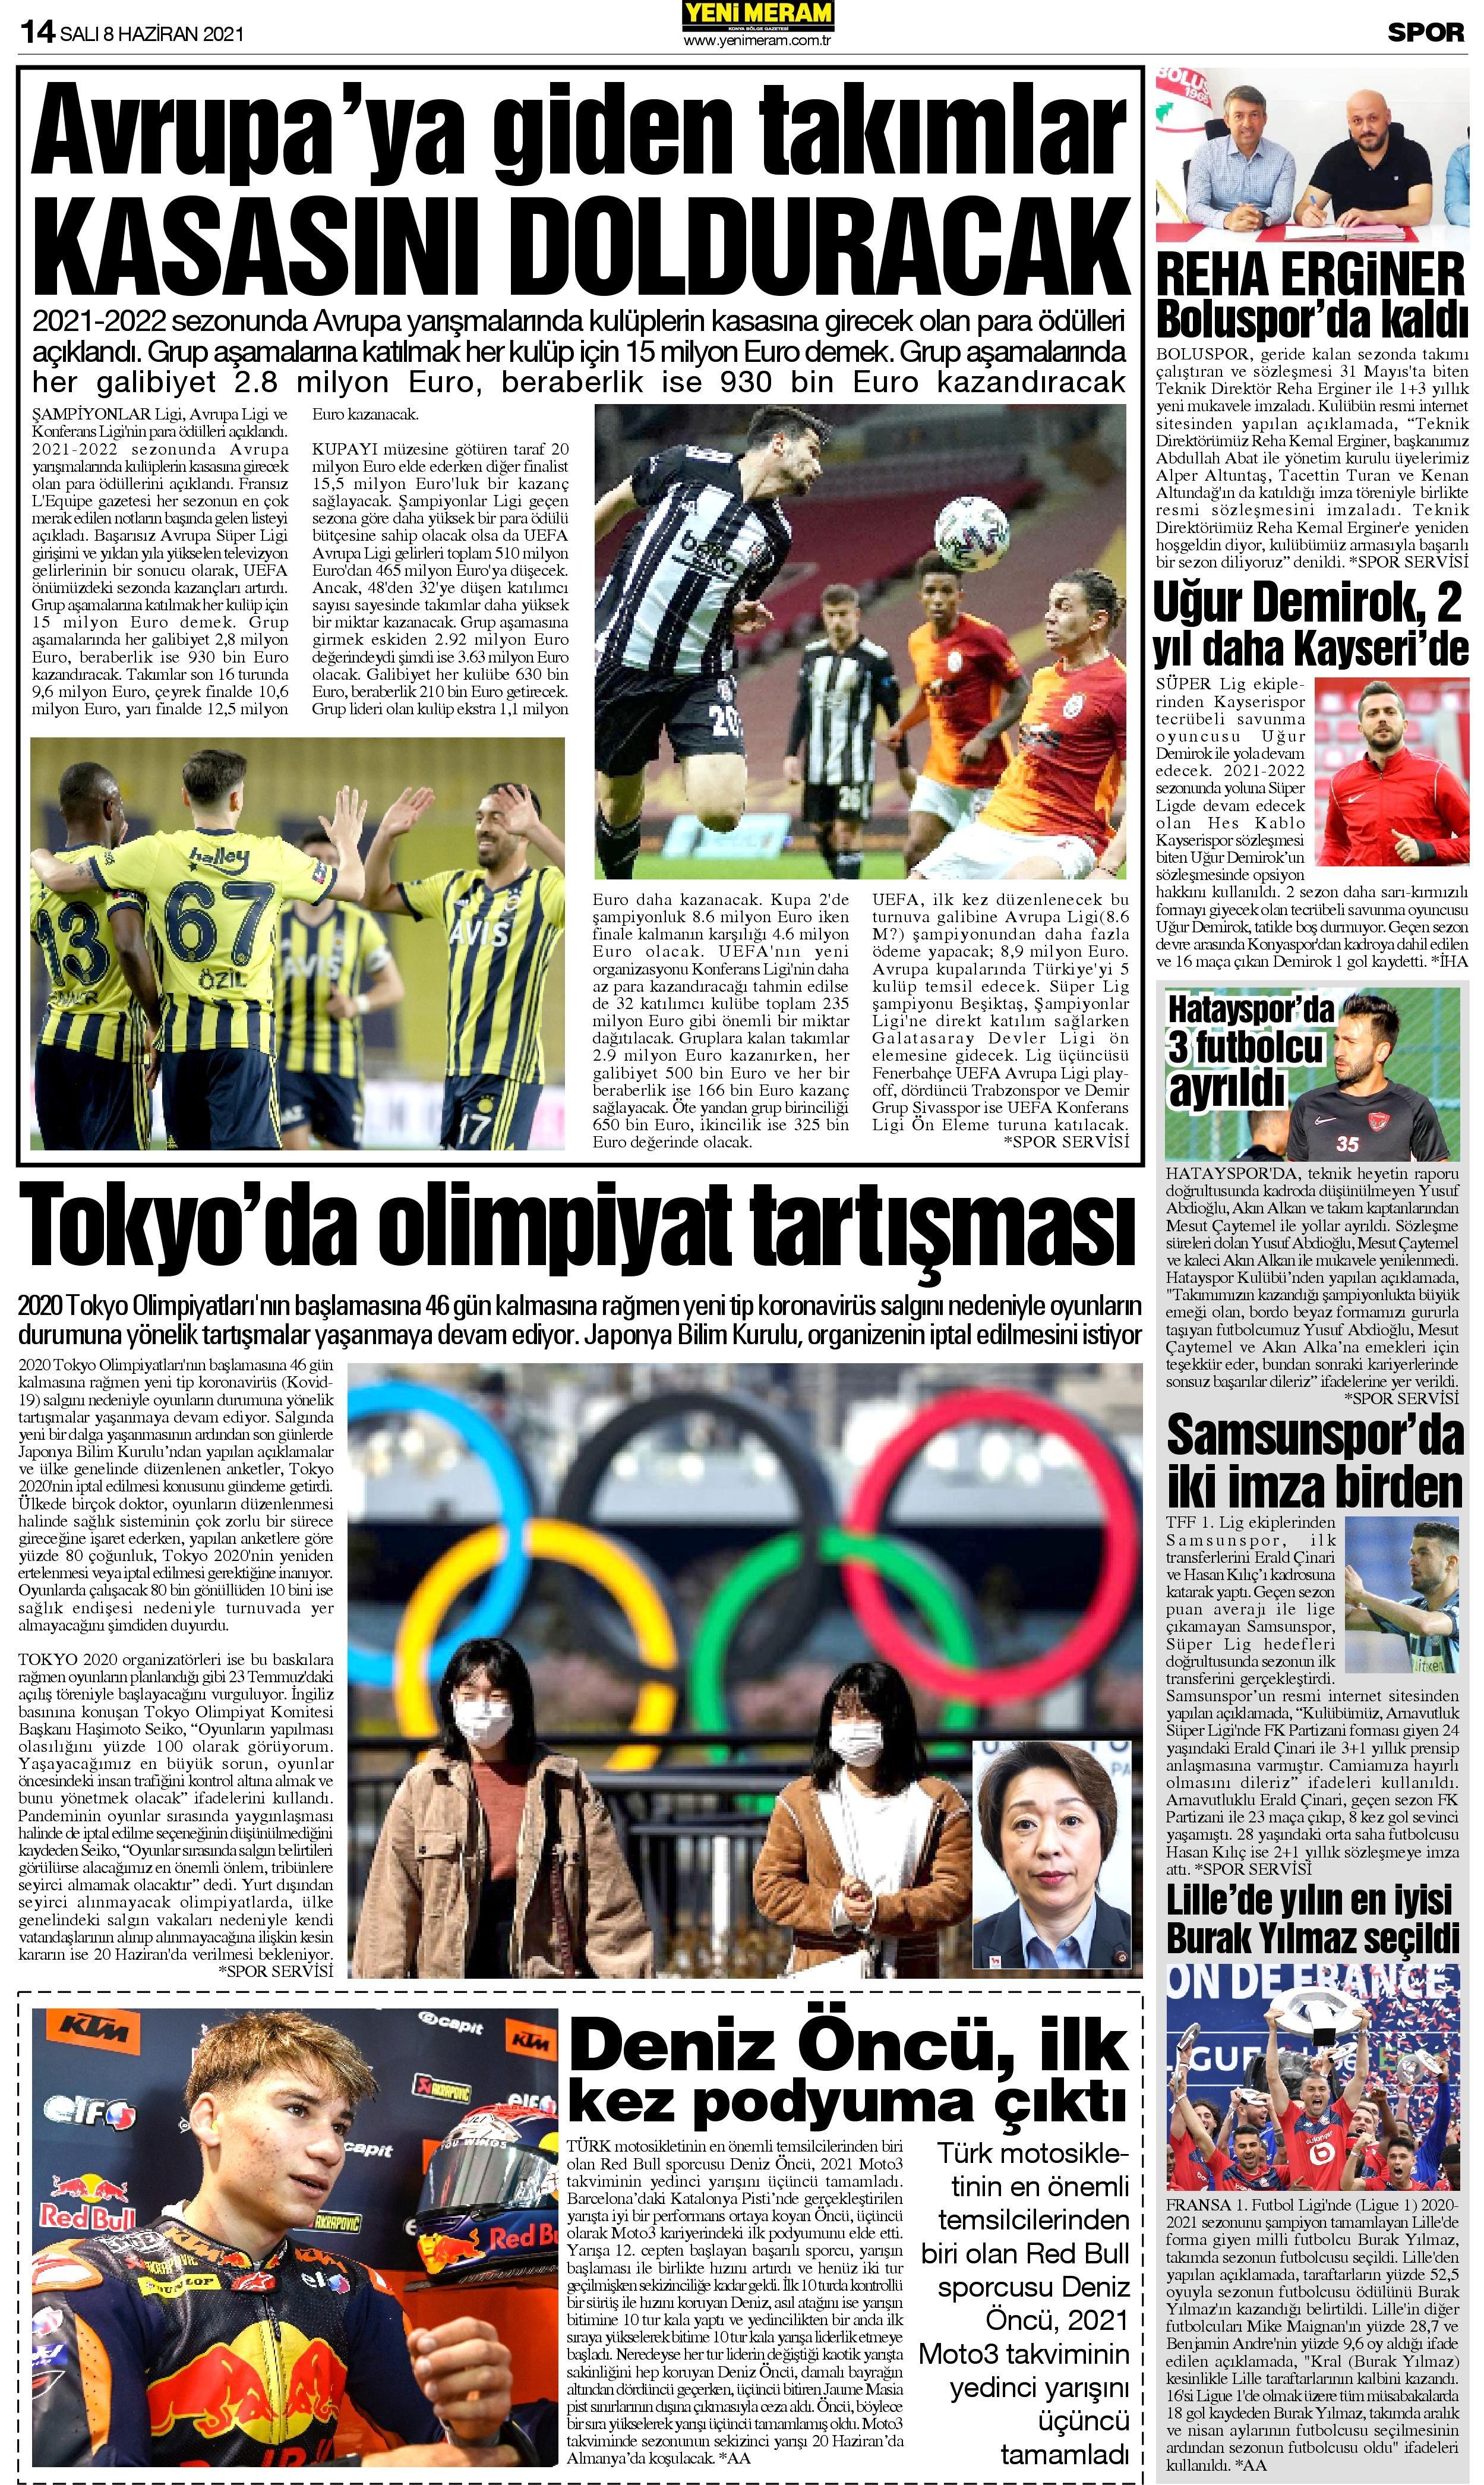 8 Haziran 2021 Yeni Meram Gazetesi